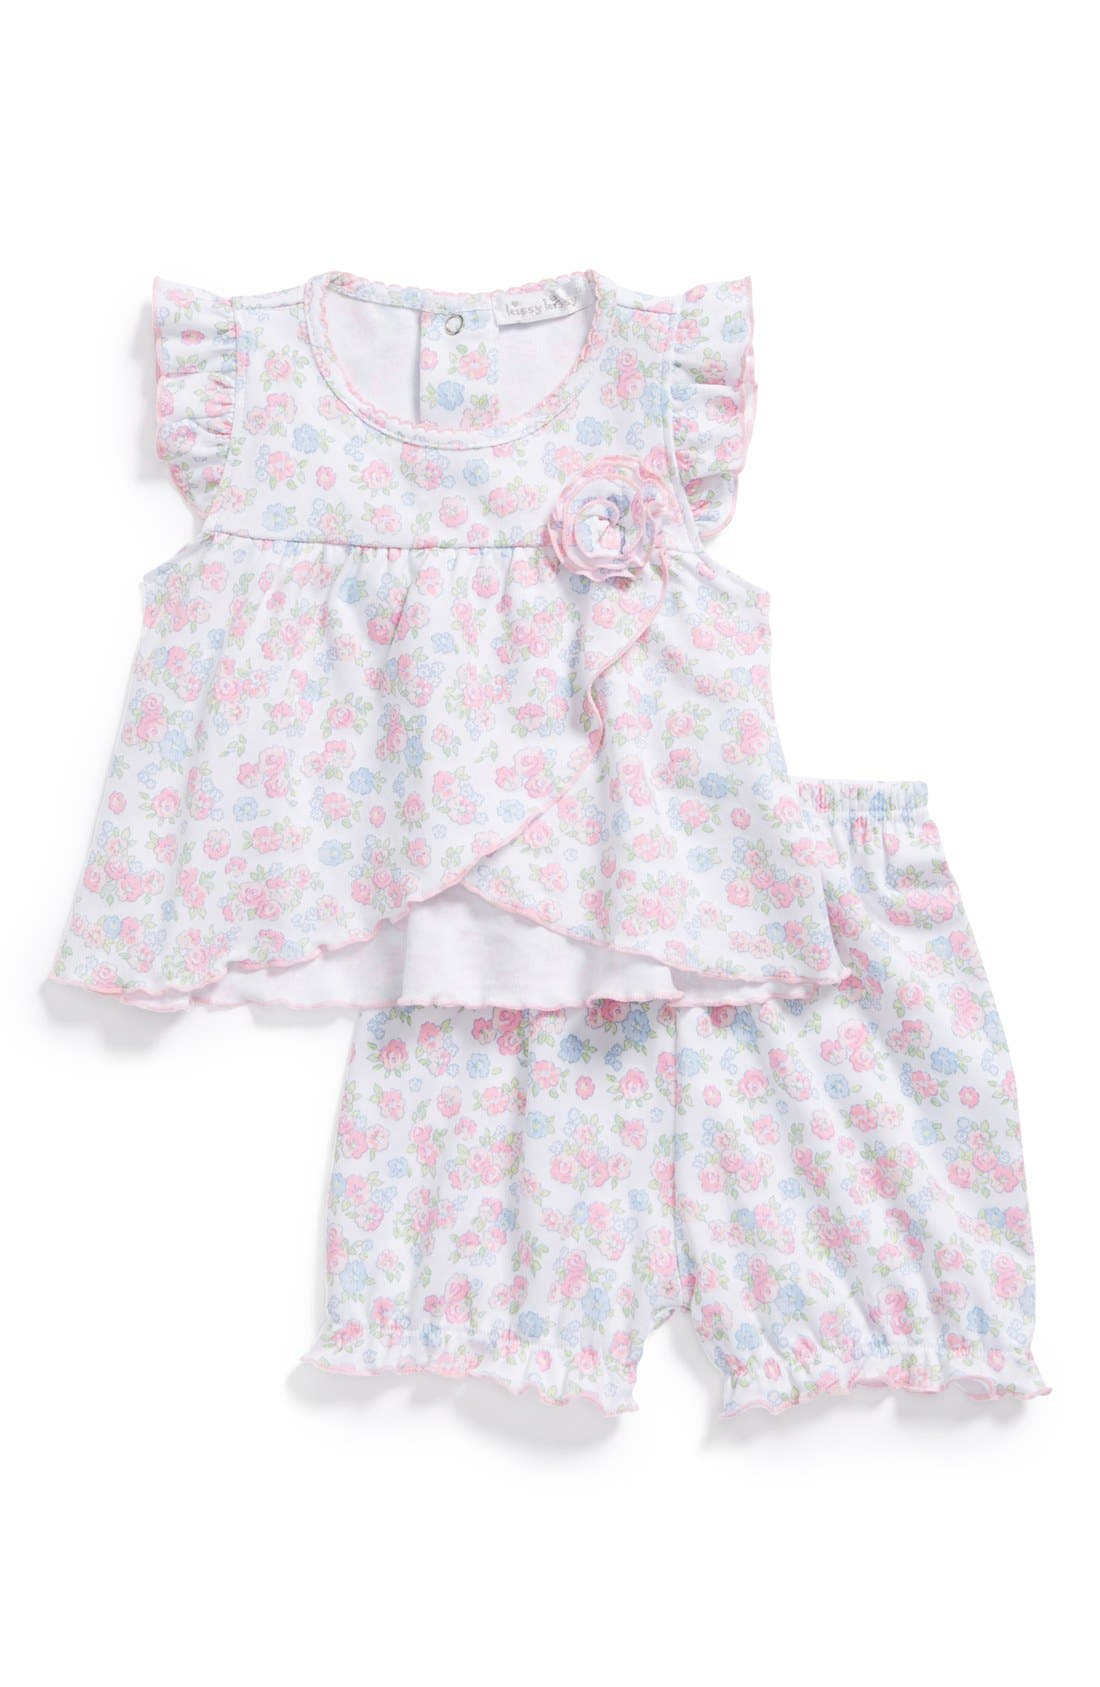 Alternate Image 1 Selected - Kissy Kissy 'Summer Splendor' Pima Cotton Tunic & Shorts (Baby Girls)